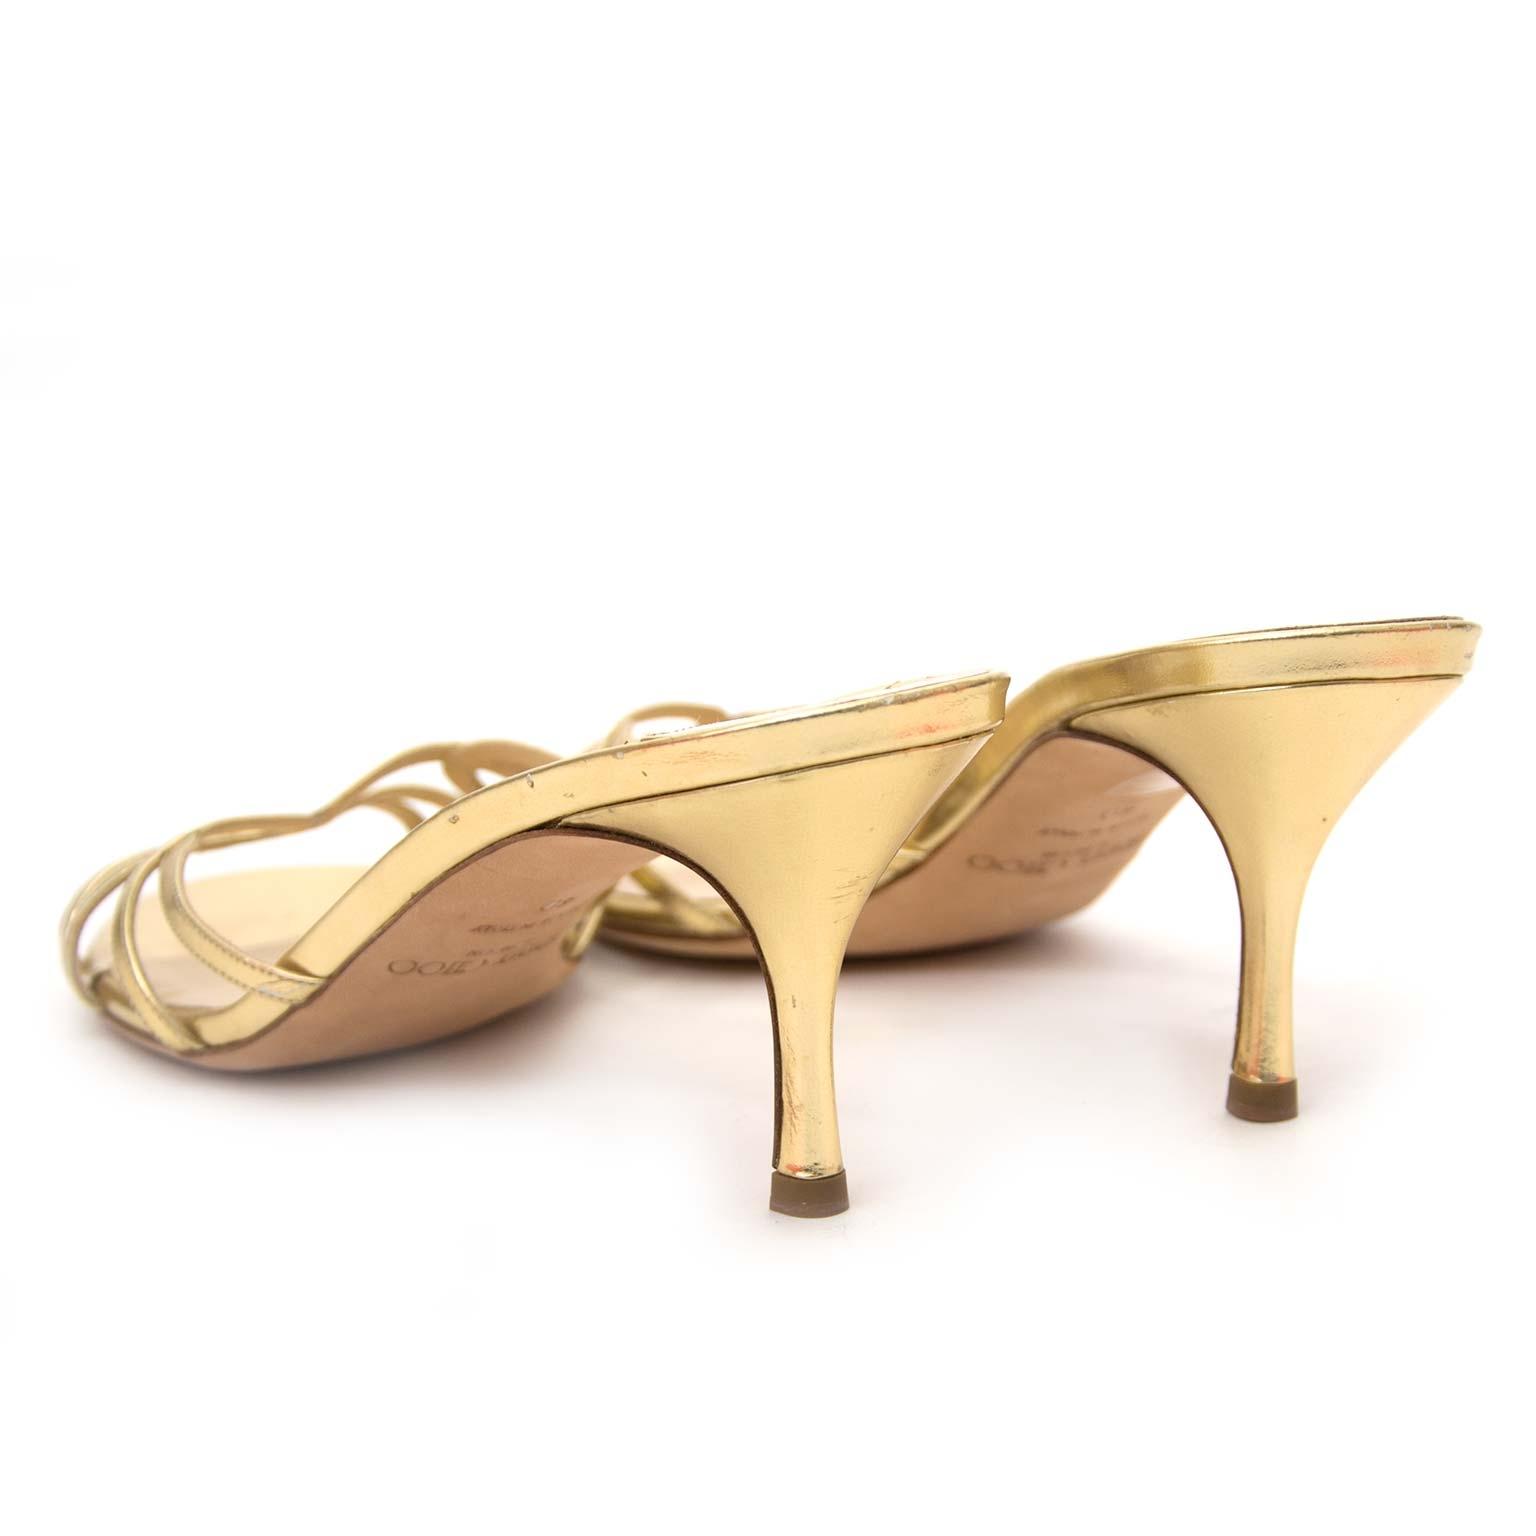 koop veilig onilne Jimmy Choo Metallic Gold Kitten Sandals - Size 40